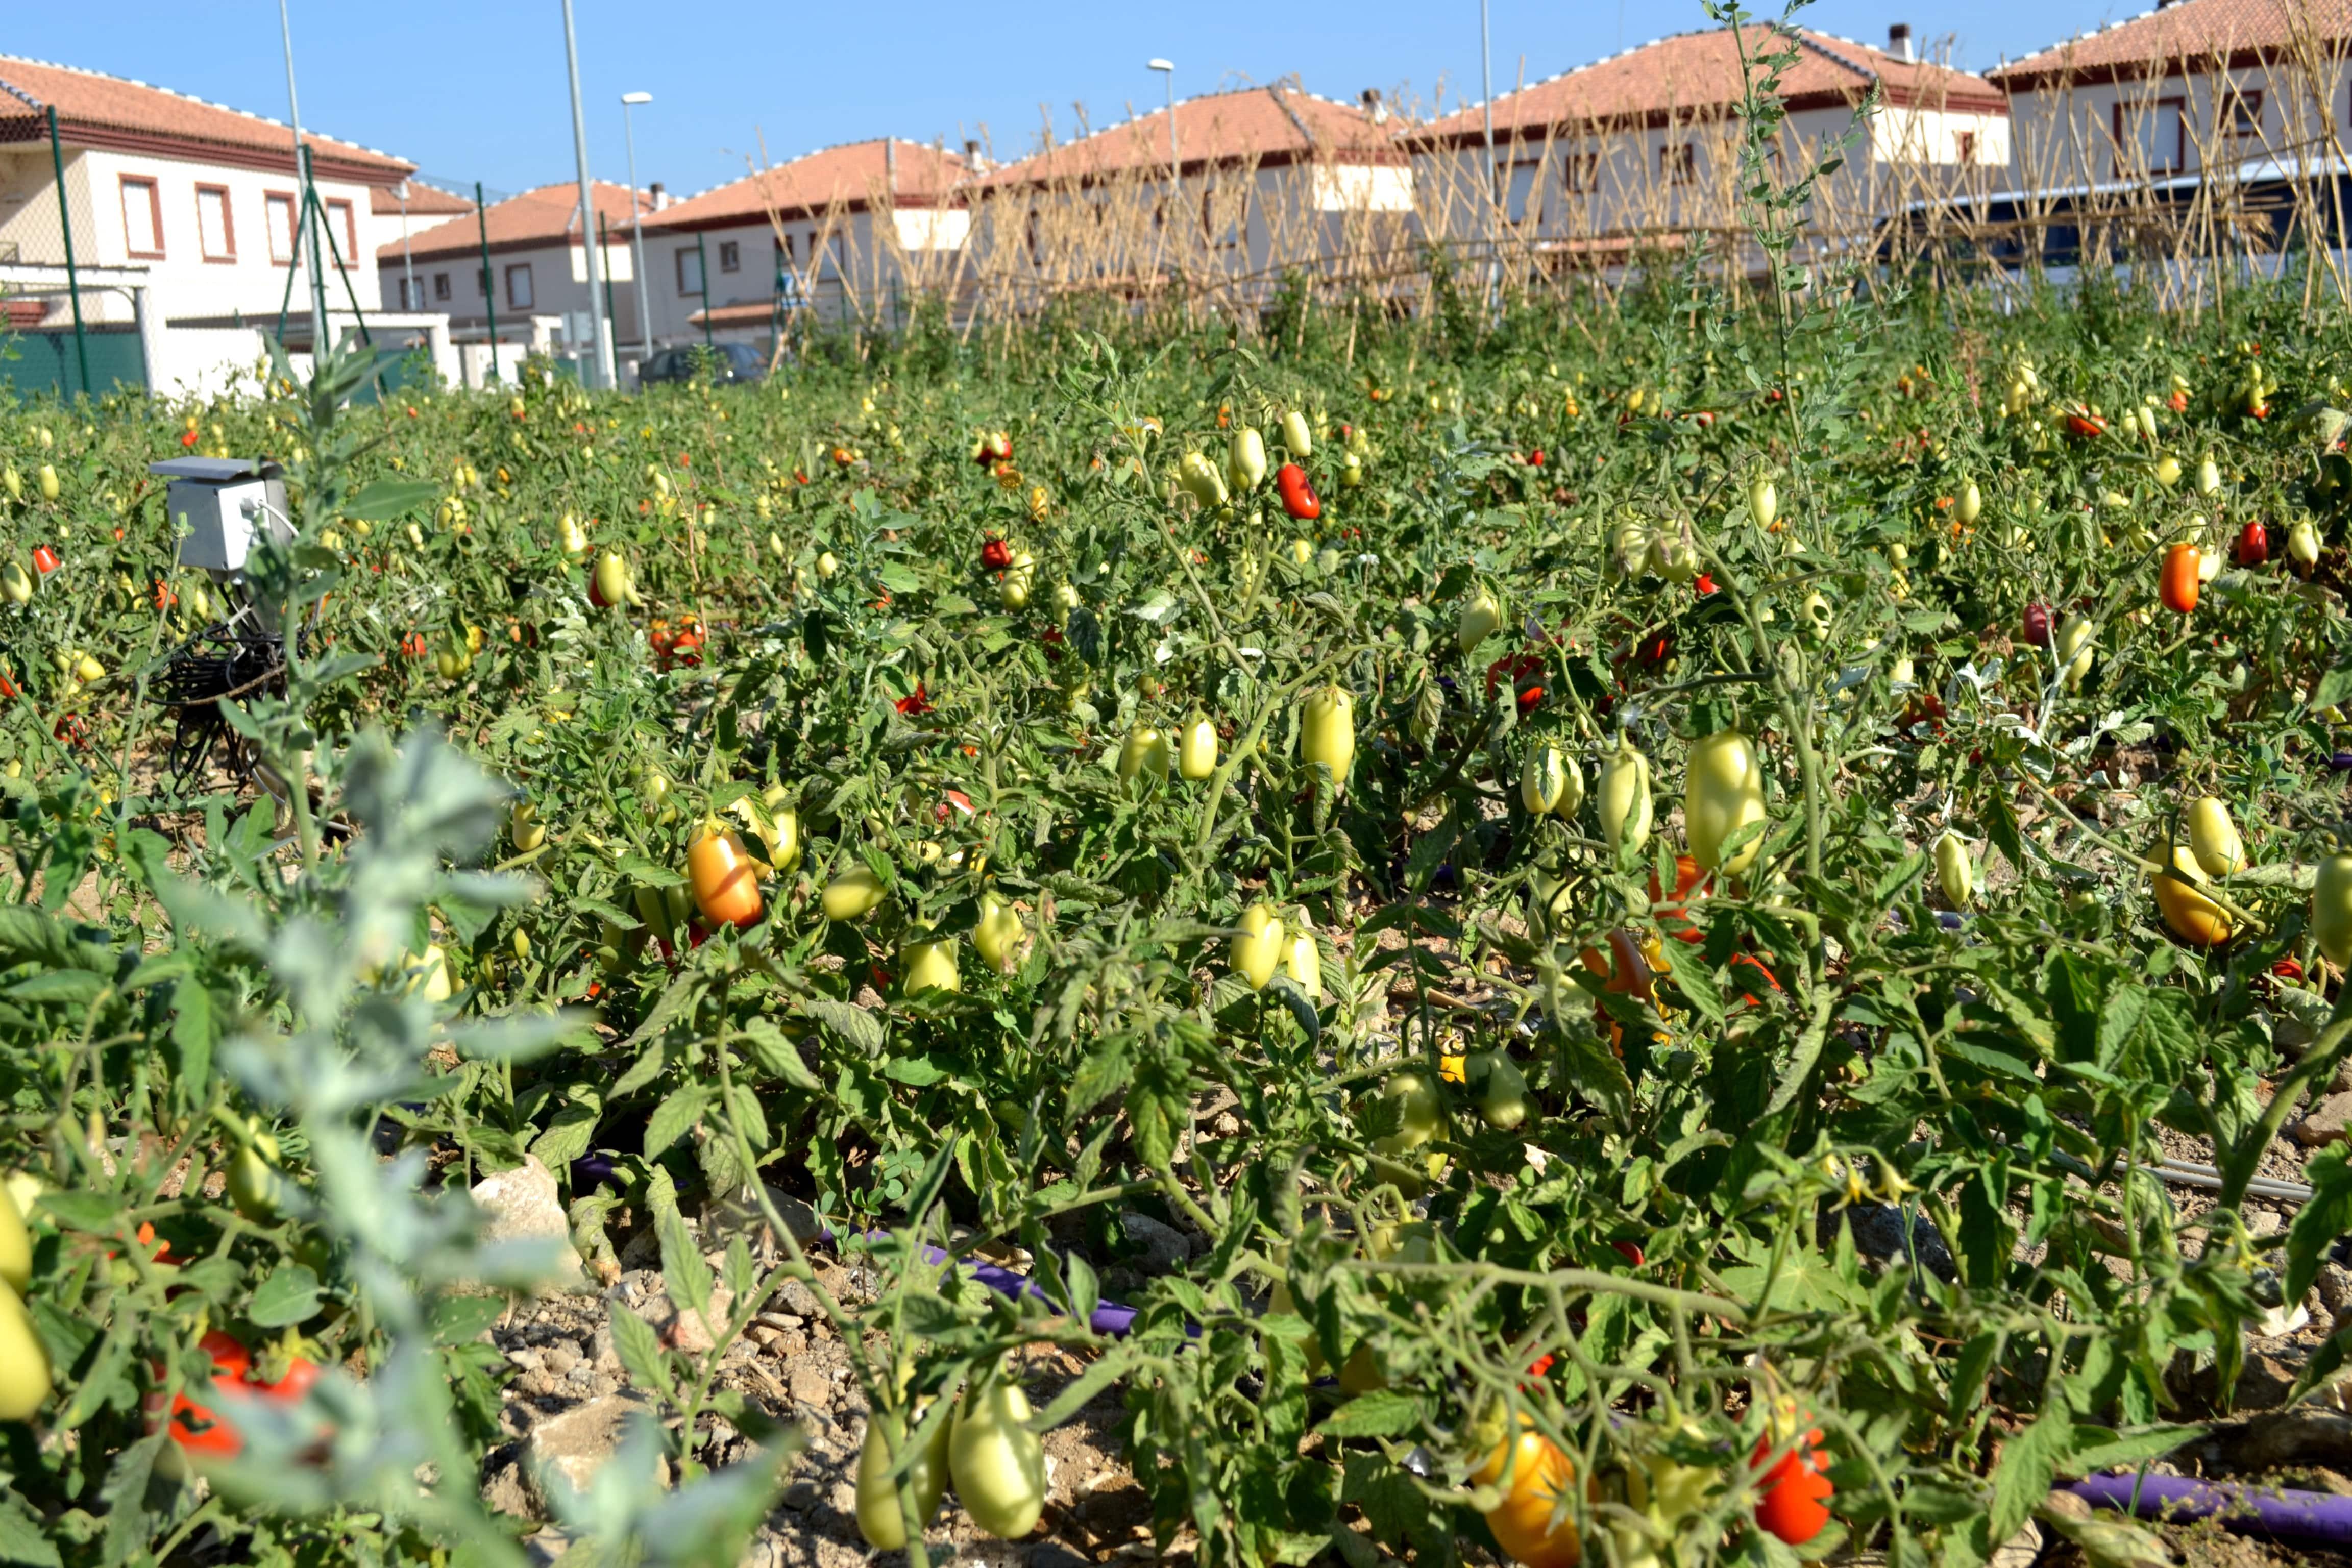 Reclaimed water system designed by Bioazul for irrigation in a community garden in Cártama (Málaga).